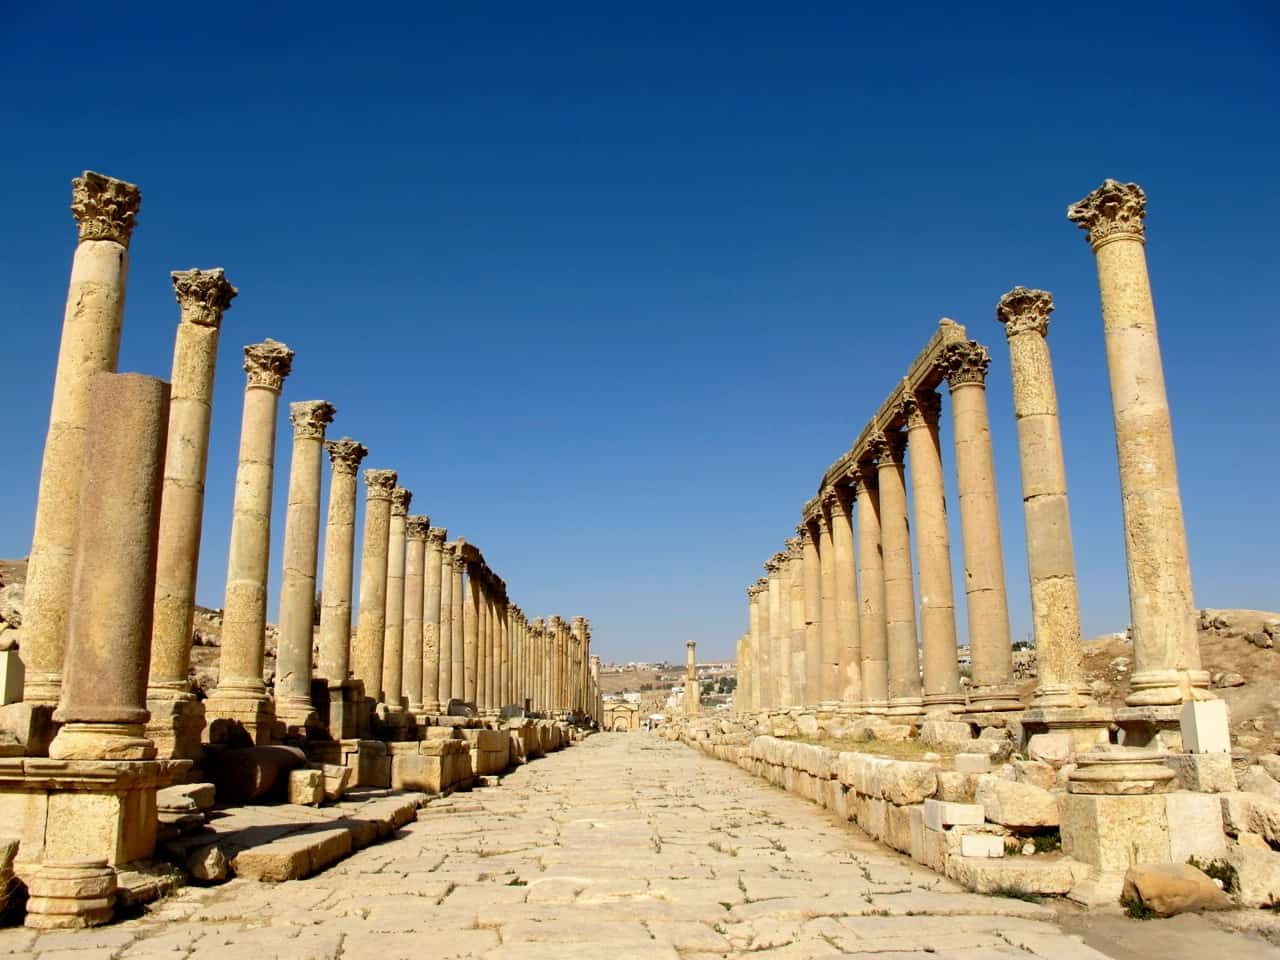 avenue-corinthian-columns-jerash-jordan-photo